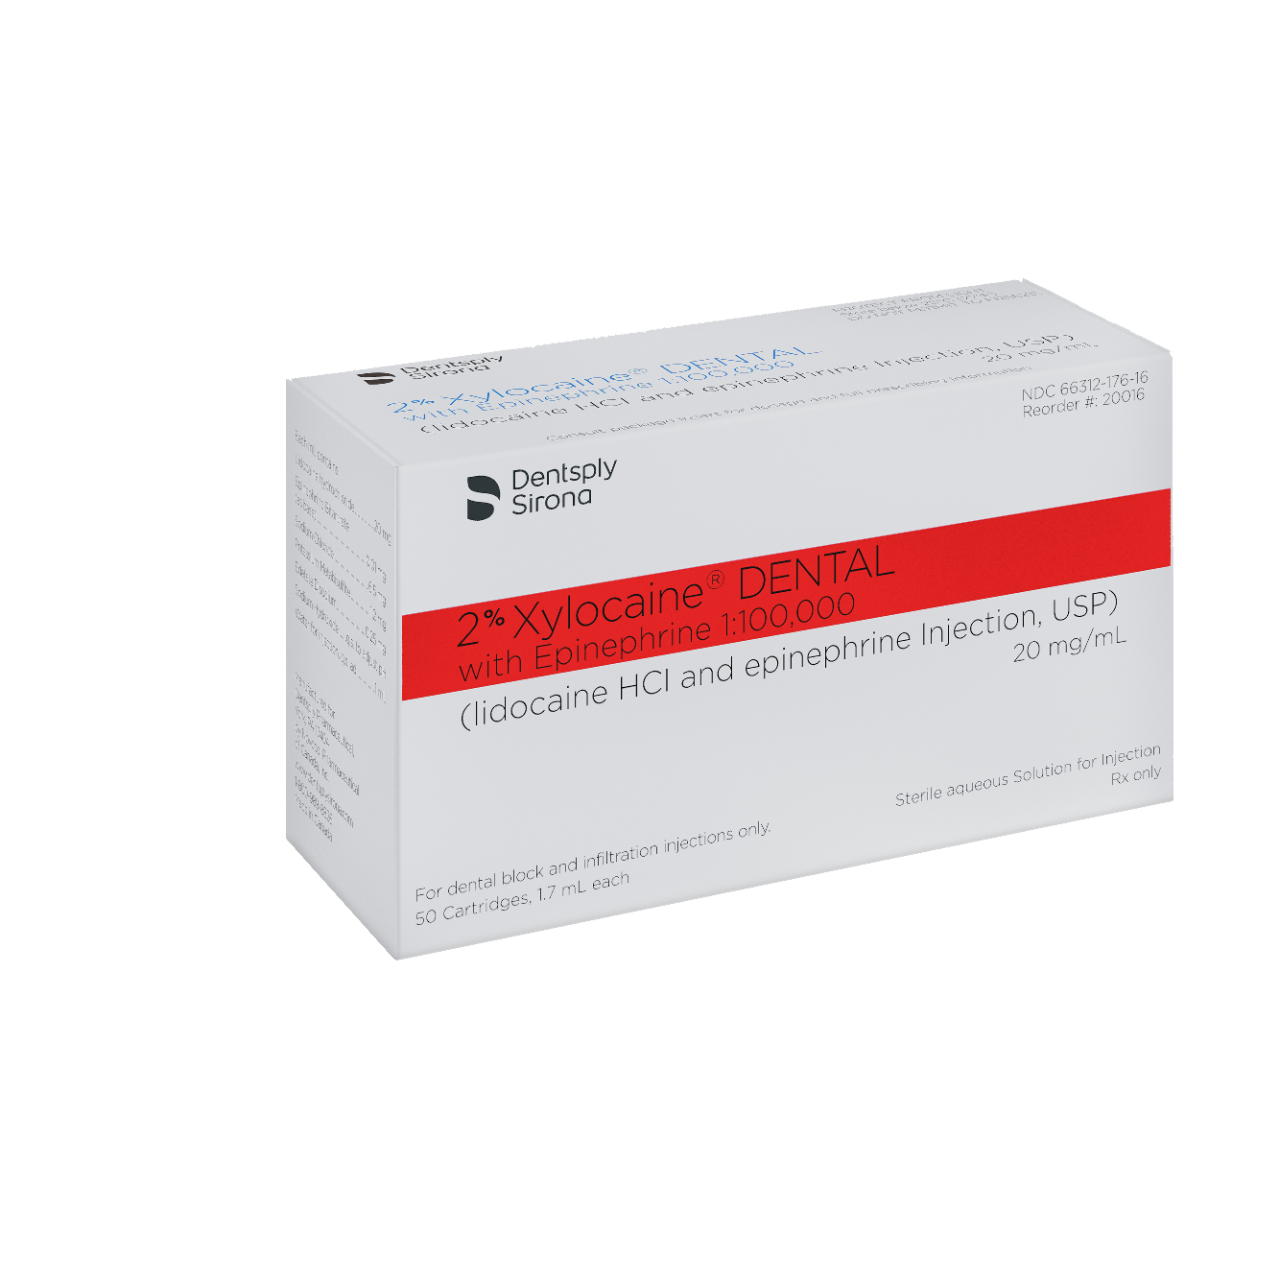 Xylocaine 2% (lidocaine HCL 2% with epinephrine 1:100,000